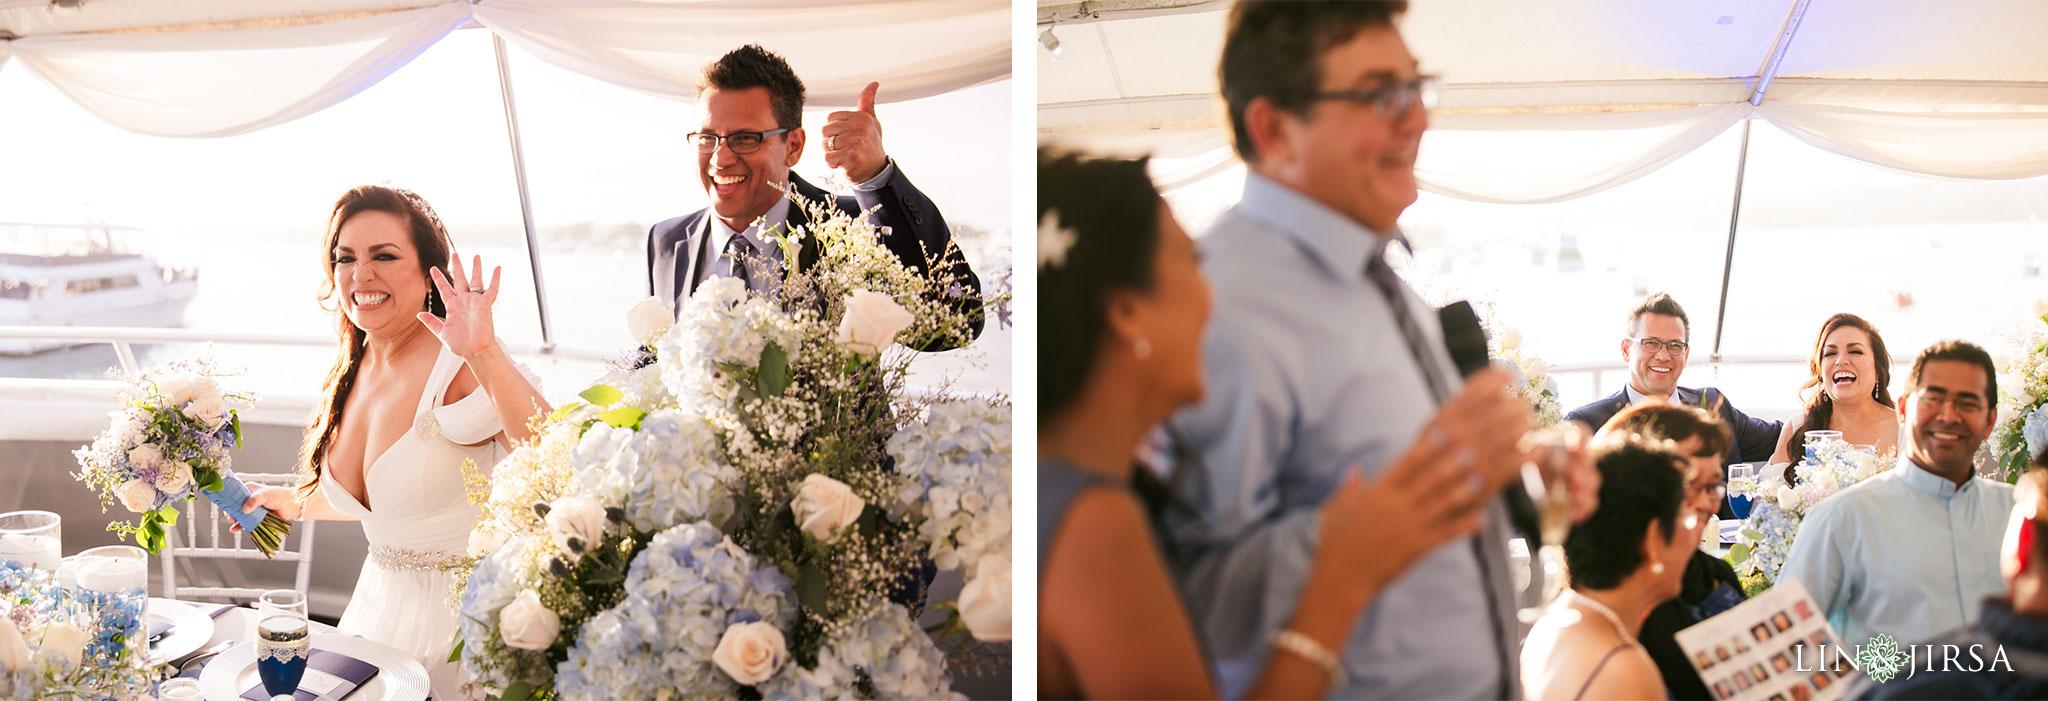 023 charter yachts newport beach wedding reception photography